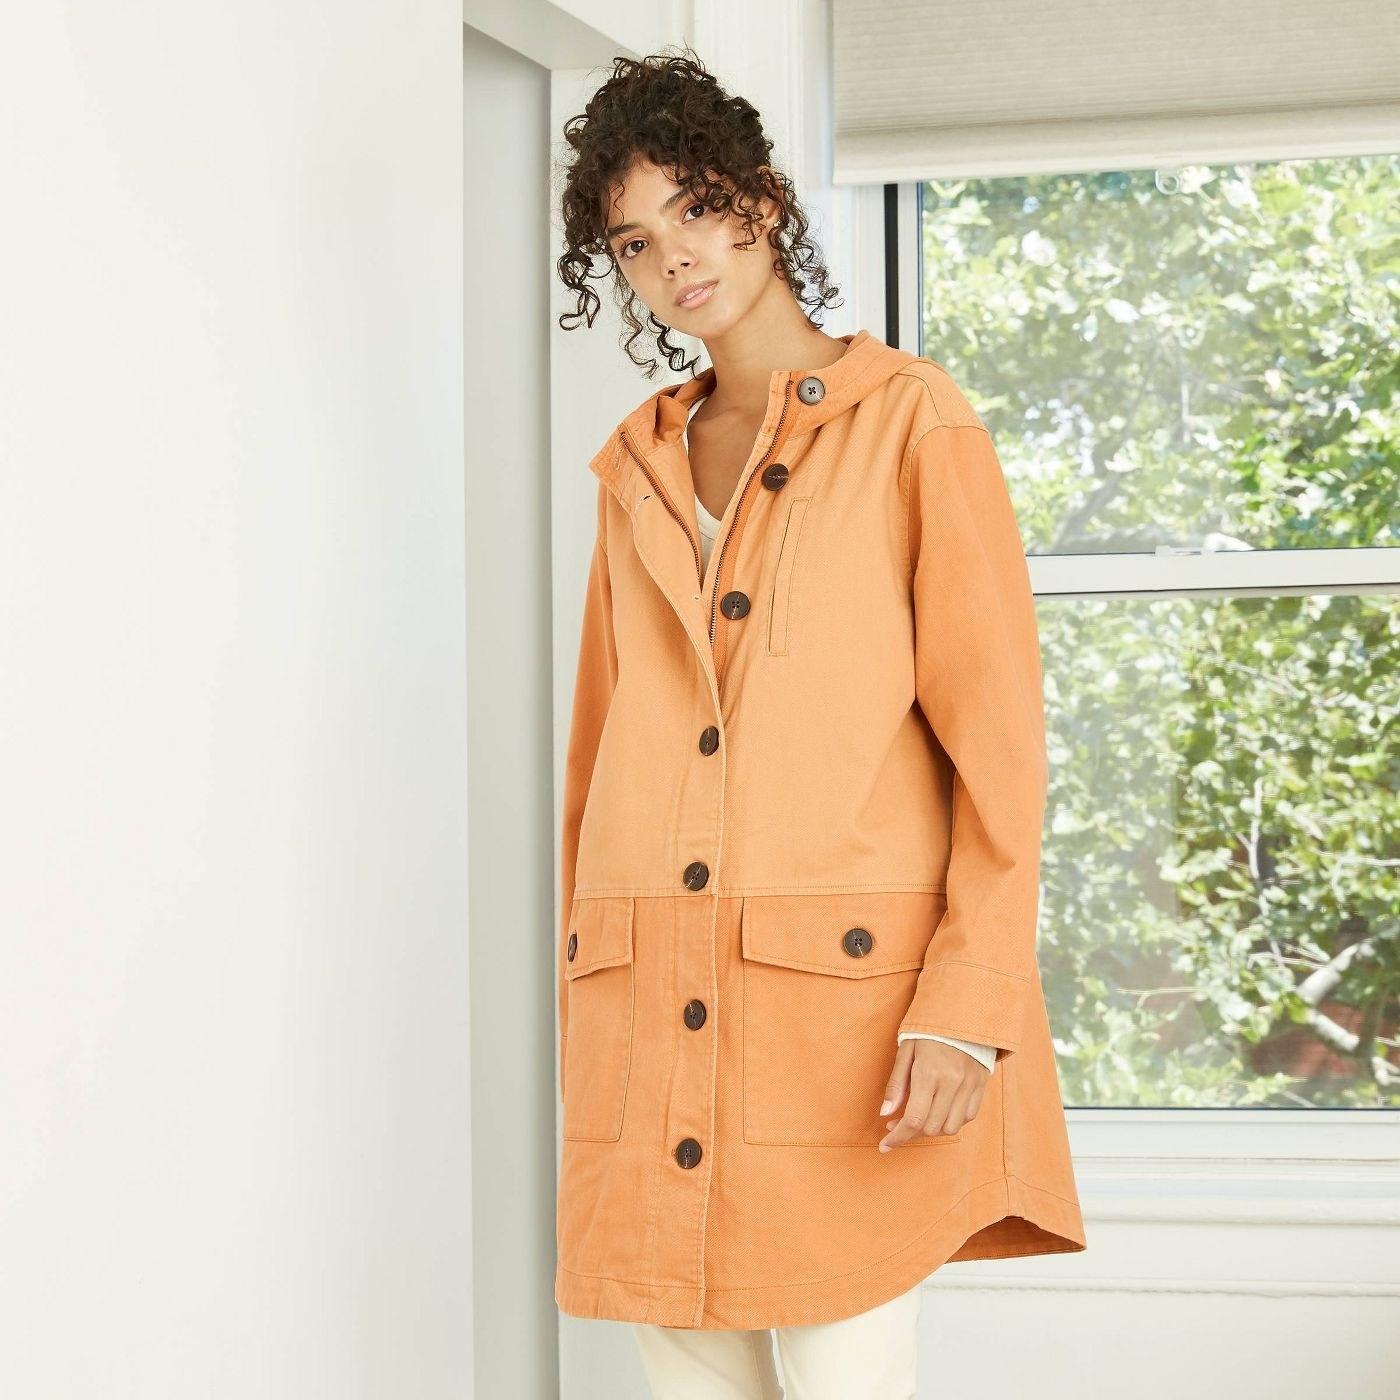 Model in orange color block jacket